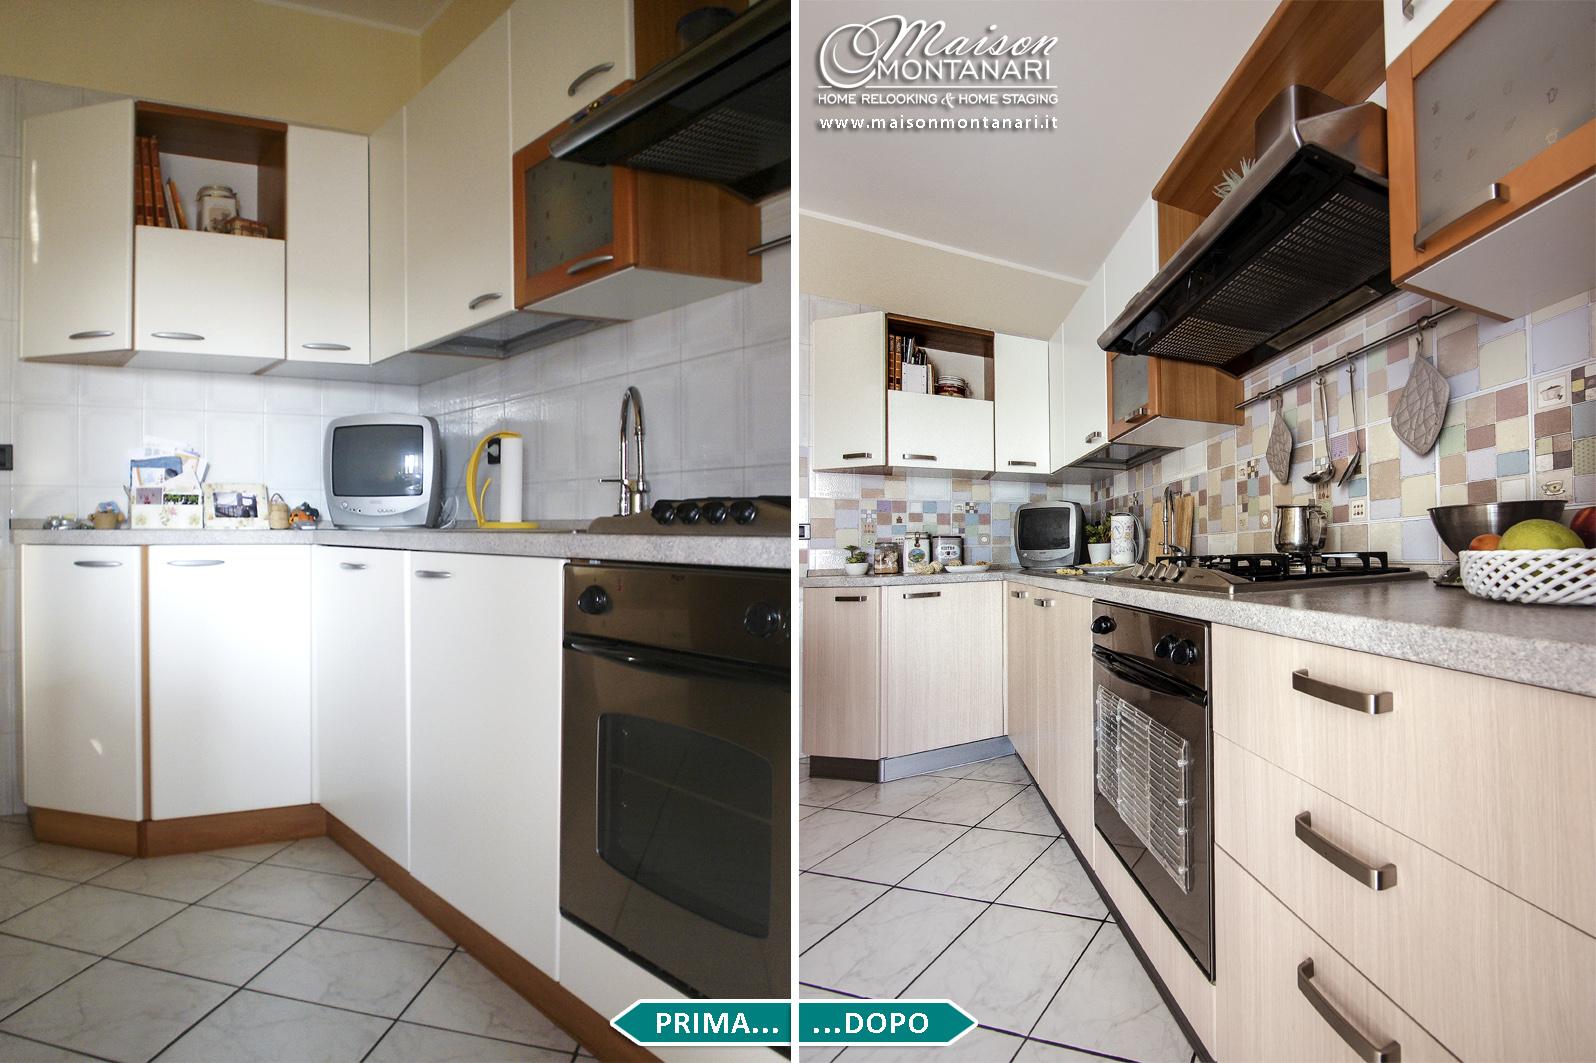 Home relooking] trasformare la cucina unendo stile vintage e moderno